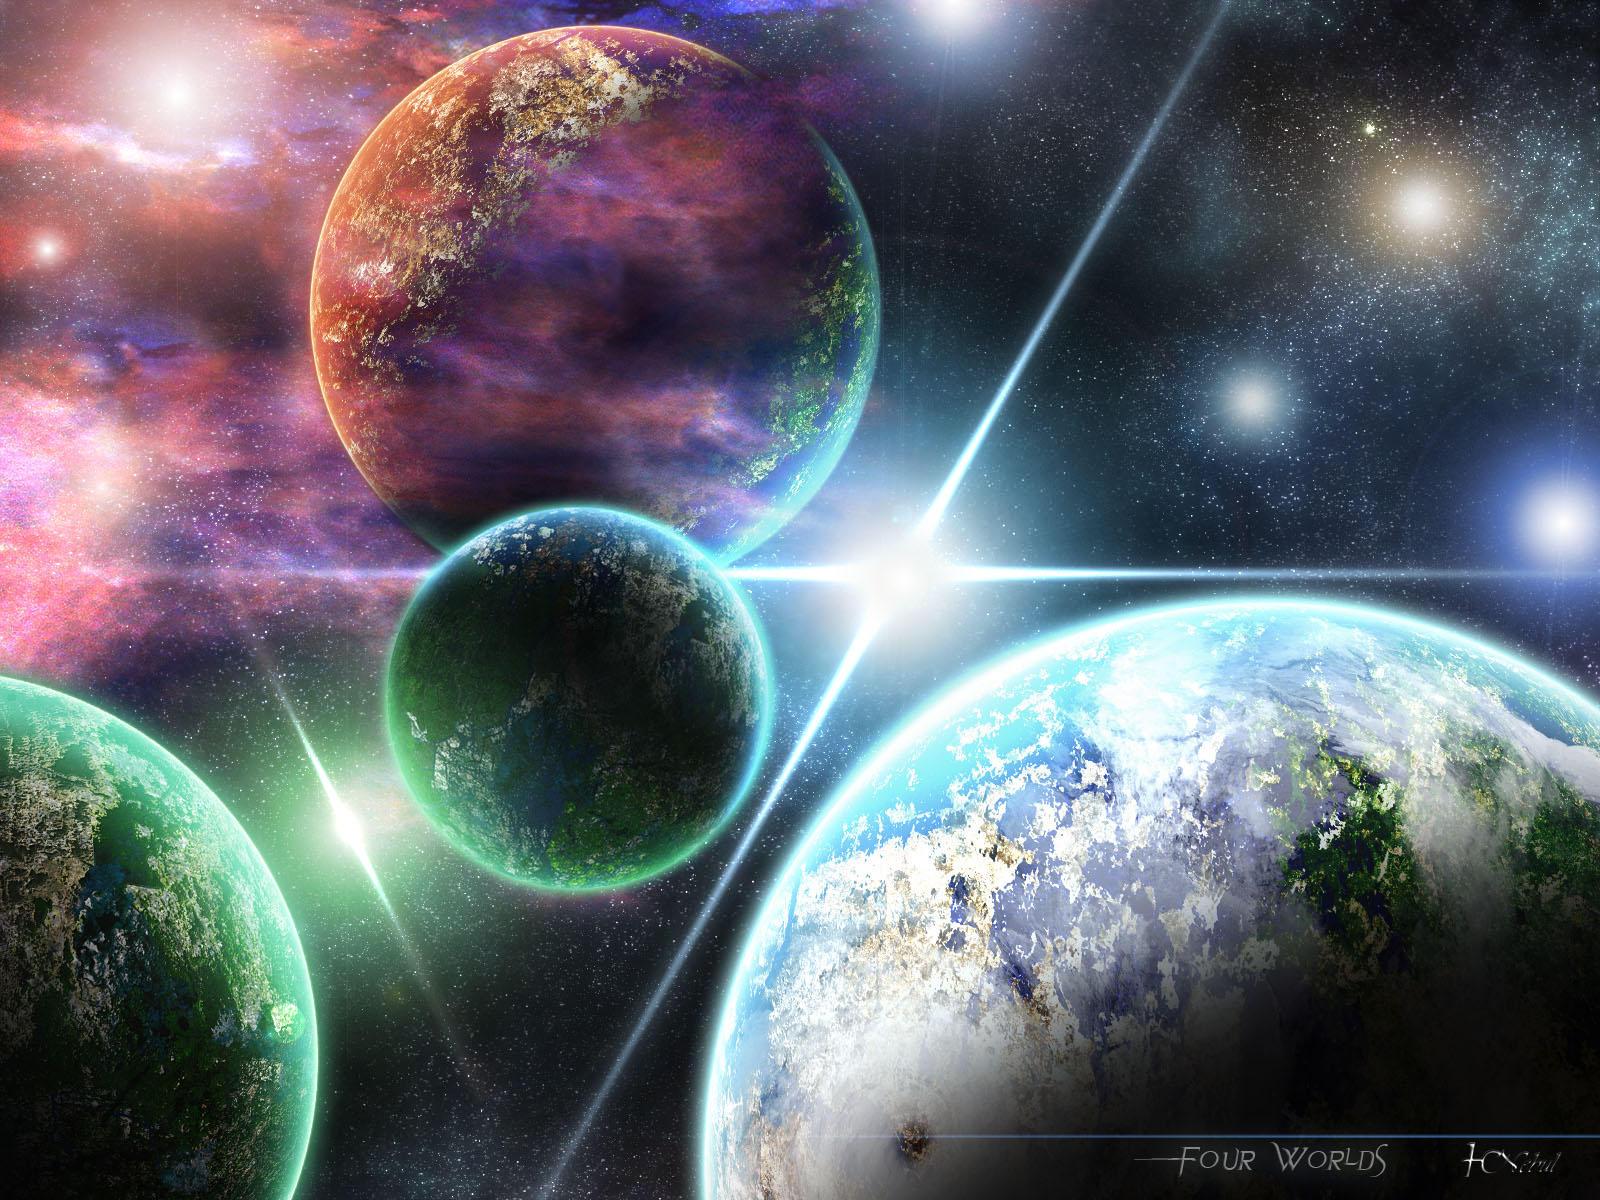 4 Worlds by Nebul